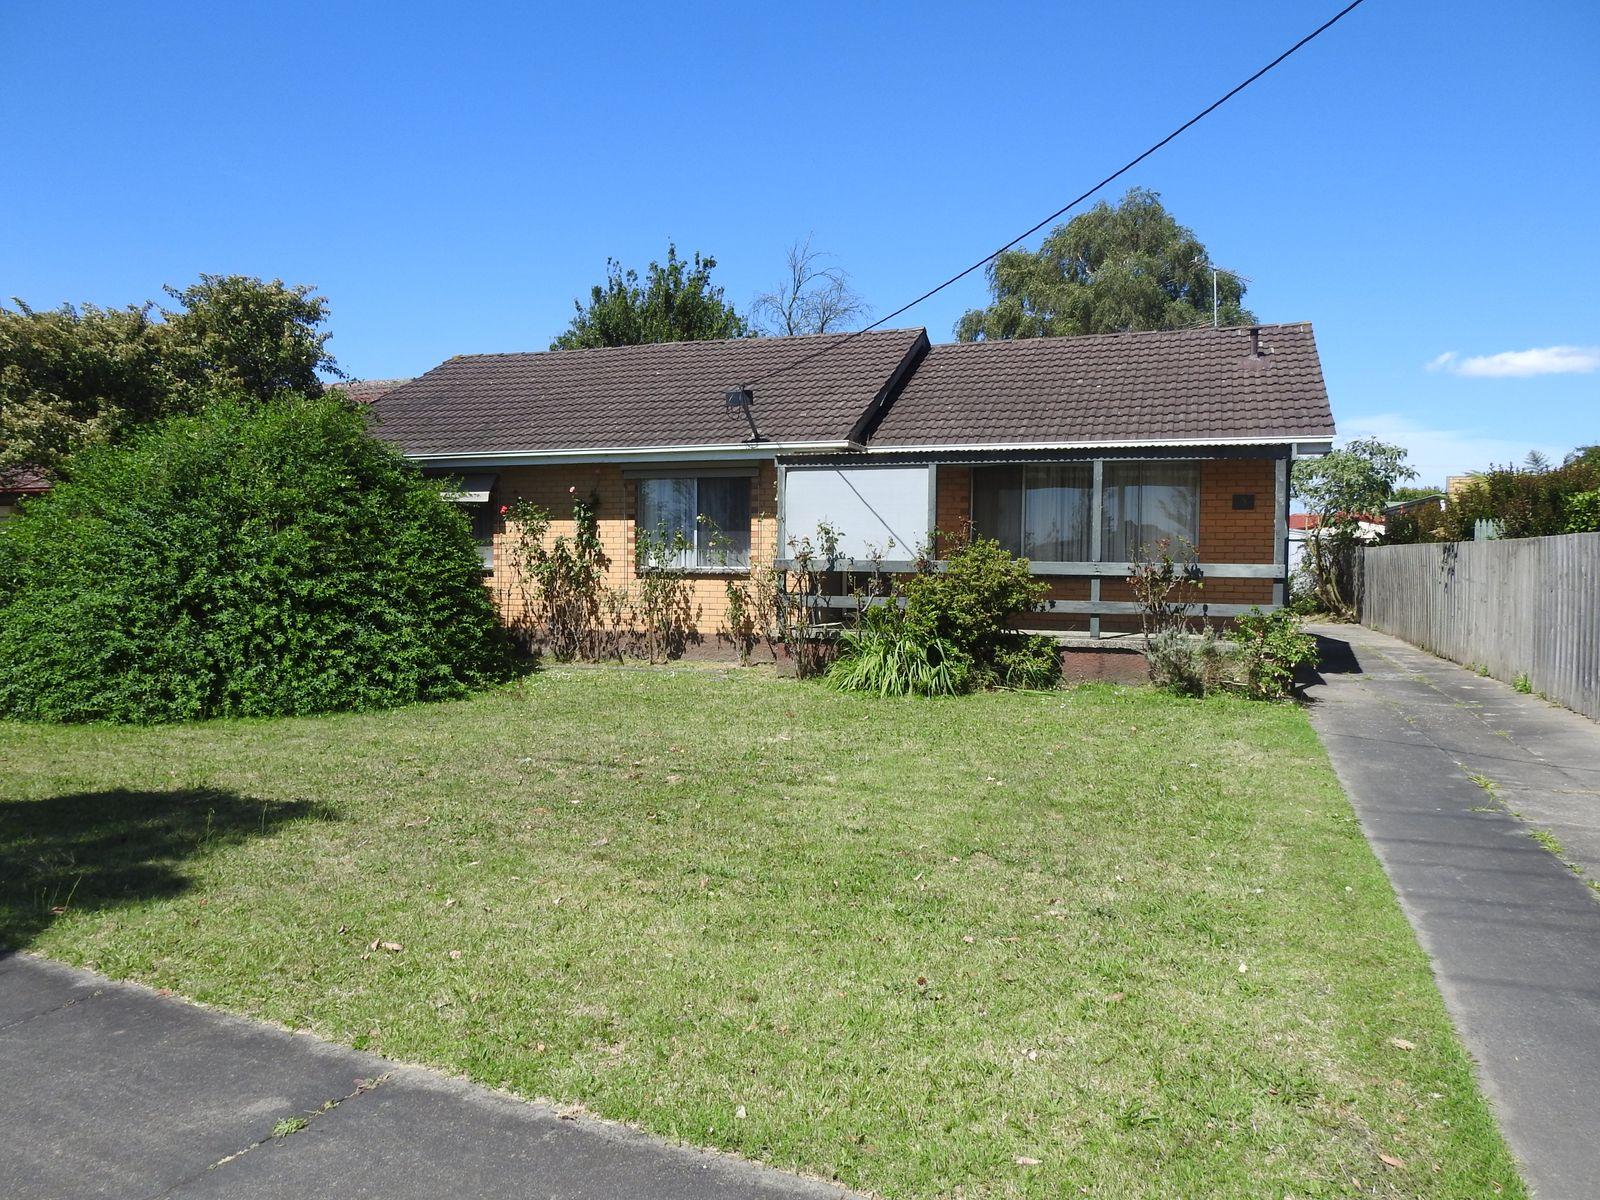 9 Watsons Road North, Moe, VIC 3825